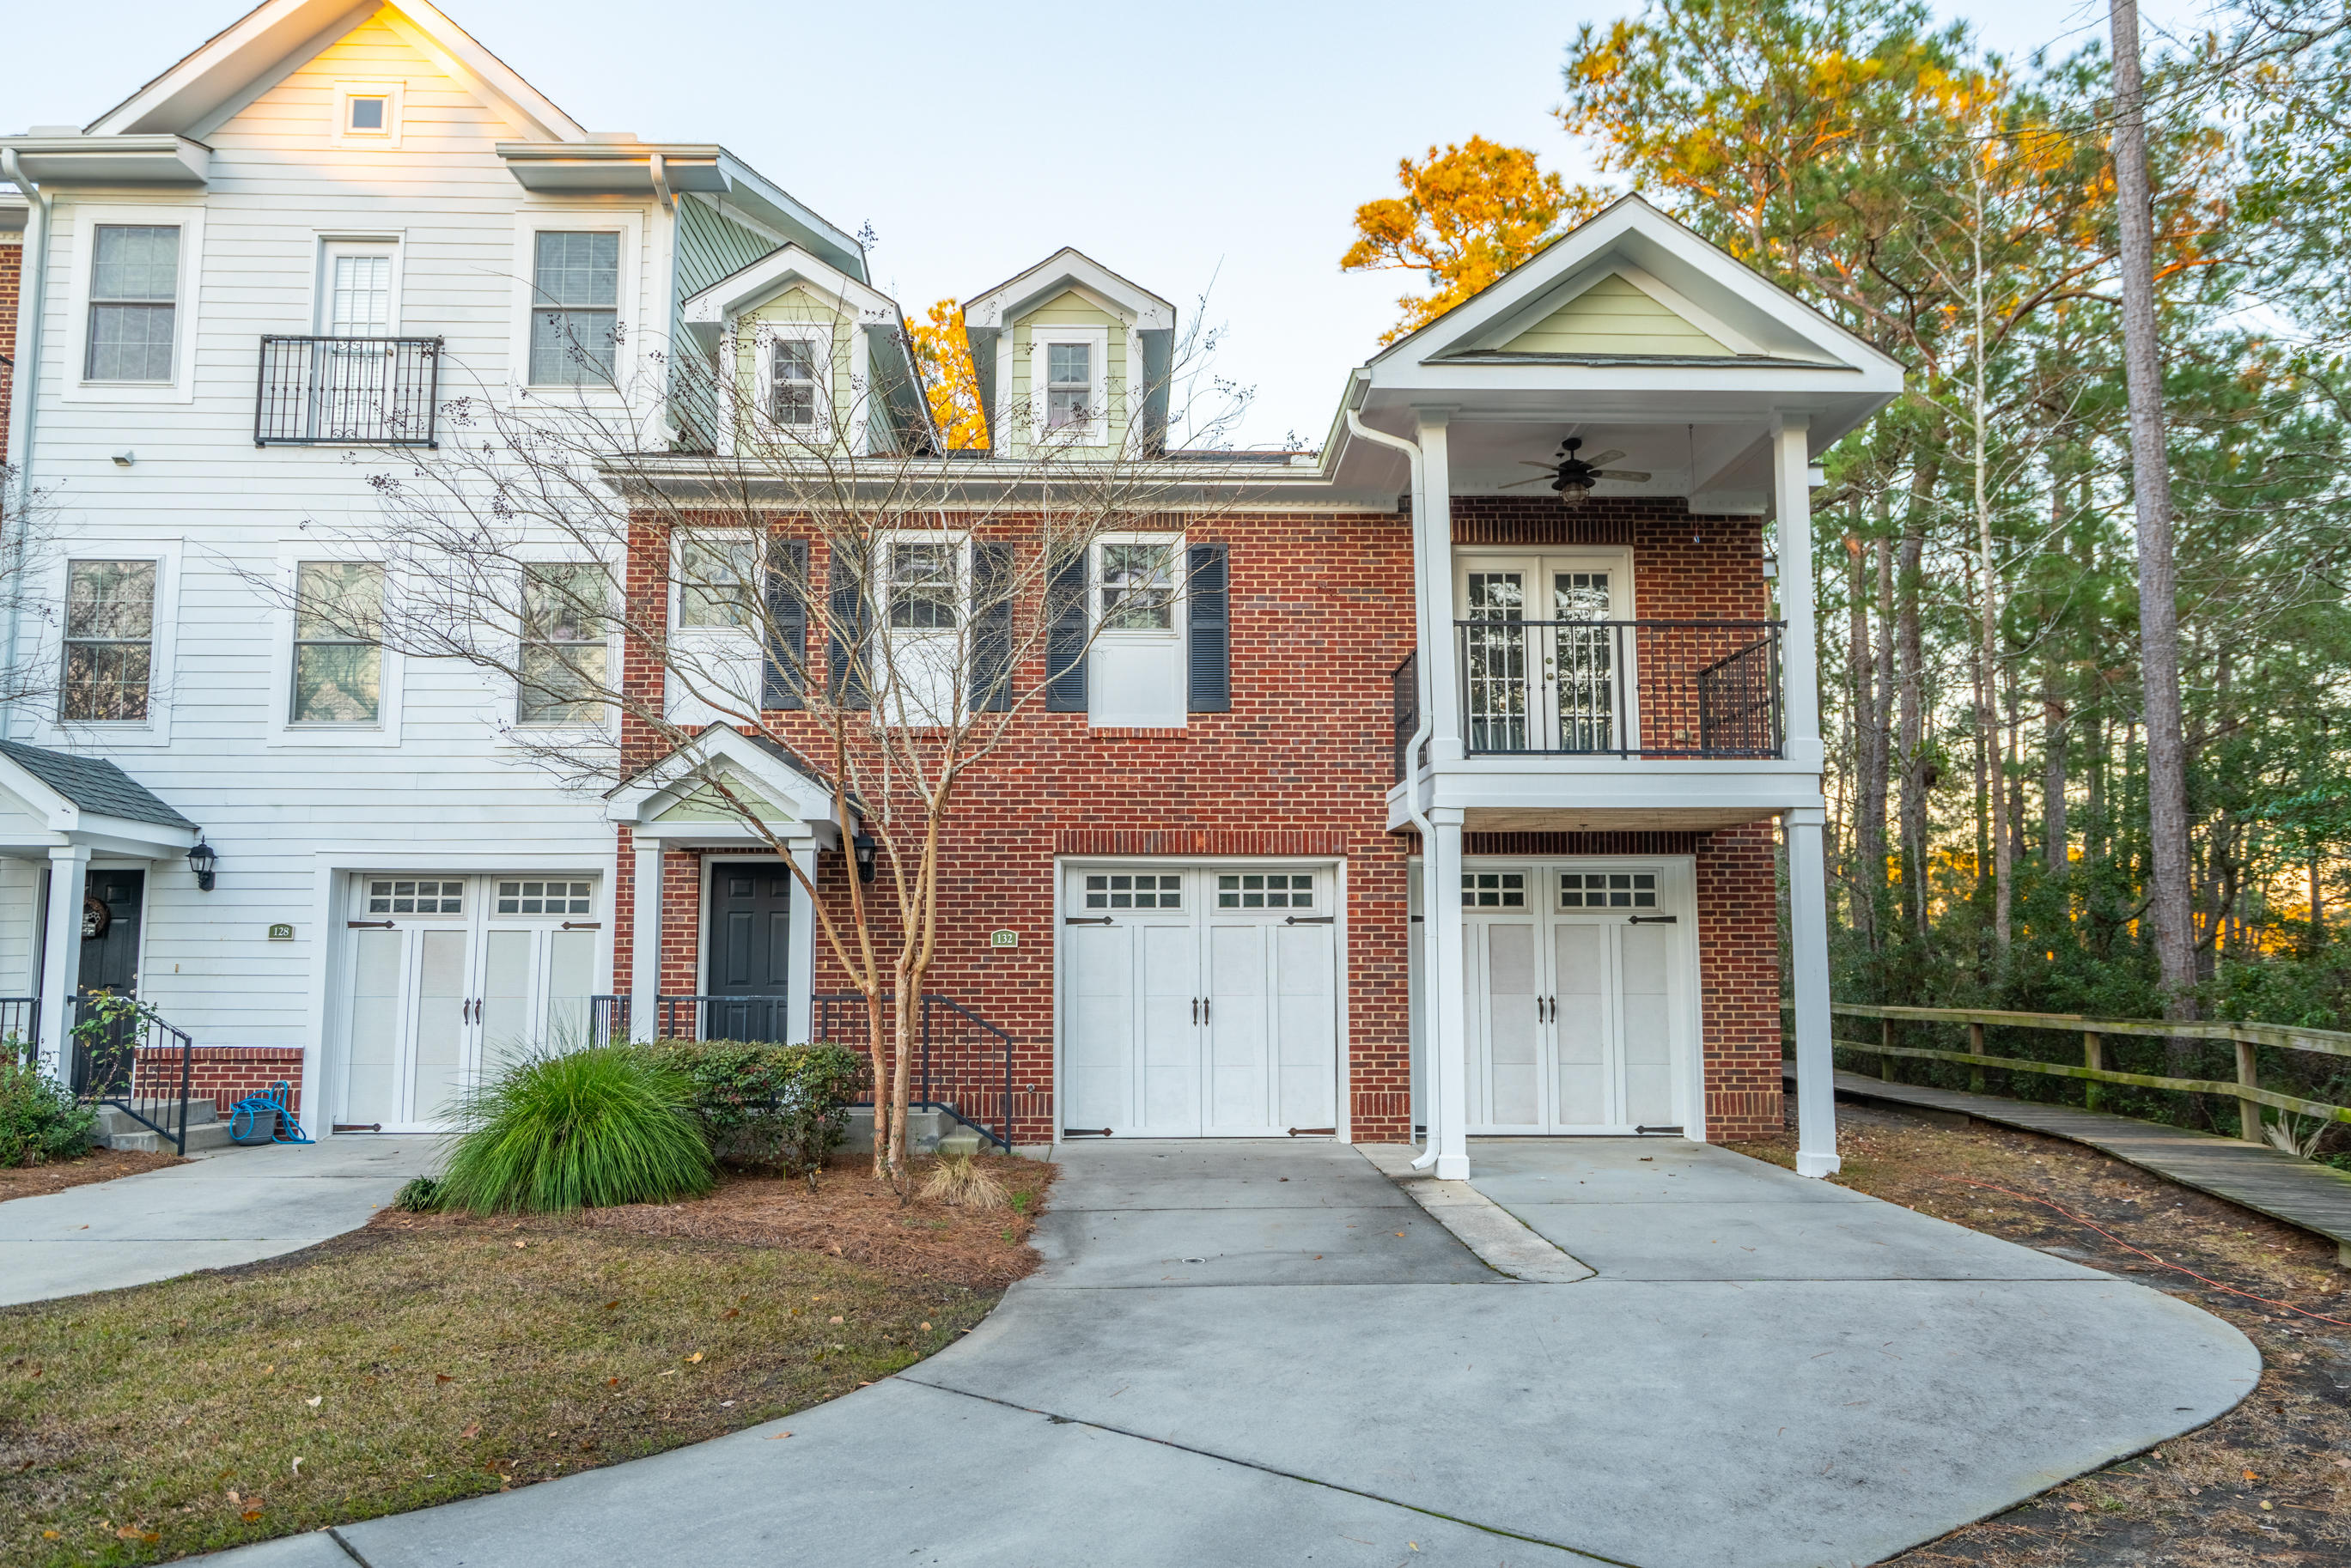 Etiwan Pointe Homes For Sale - 132 Winding Creek, Mount Pleasant, SC - 34